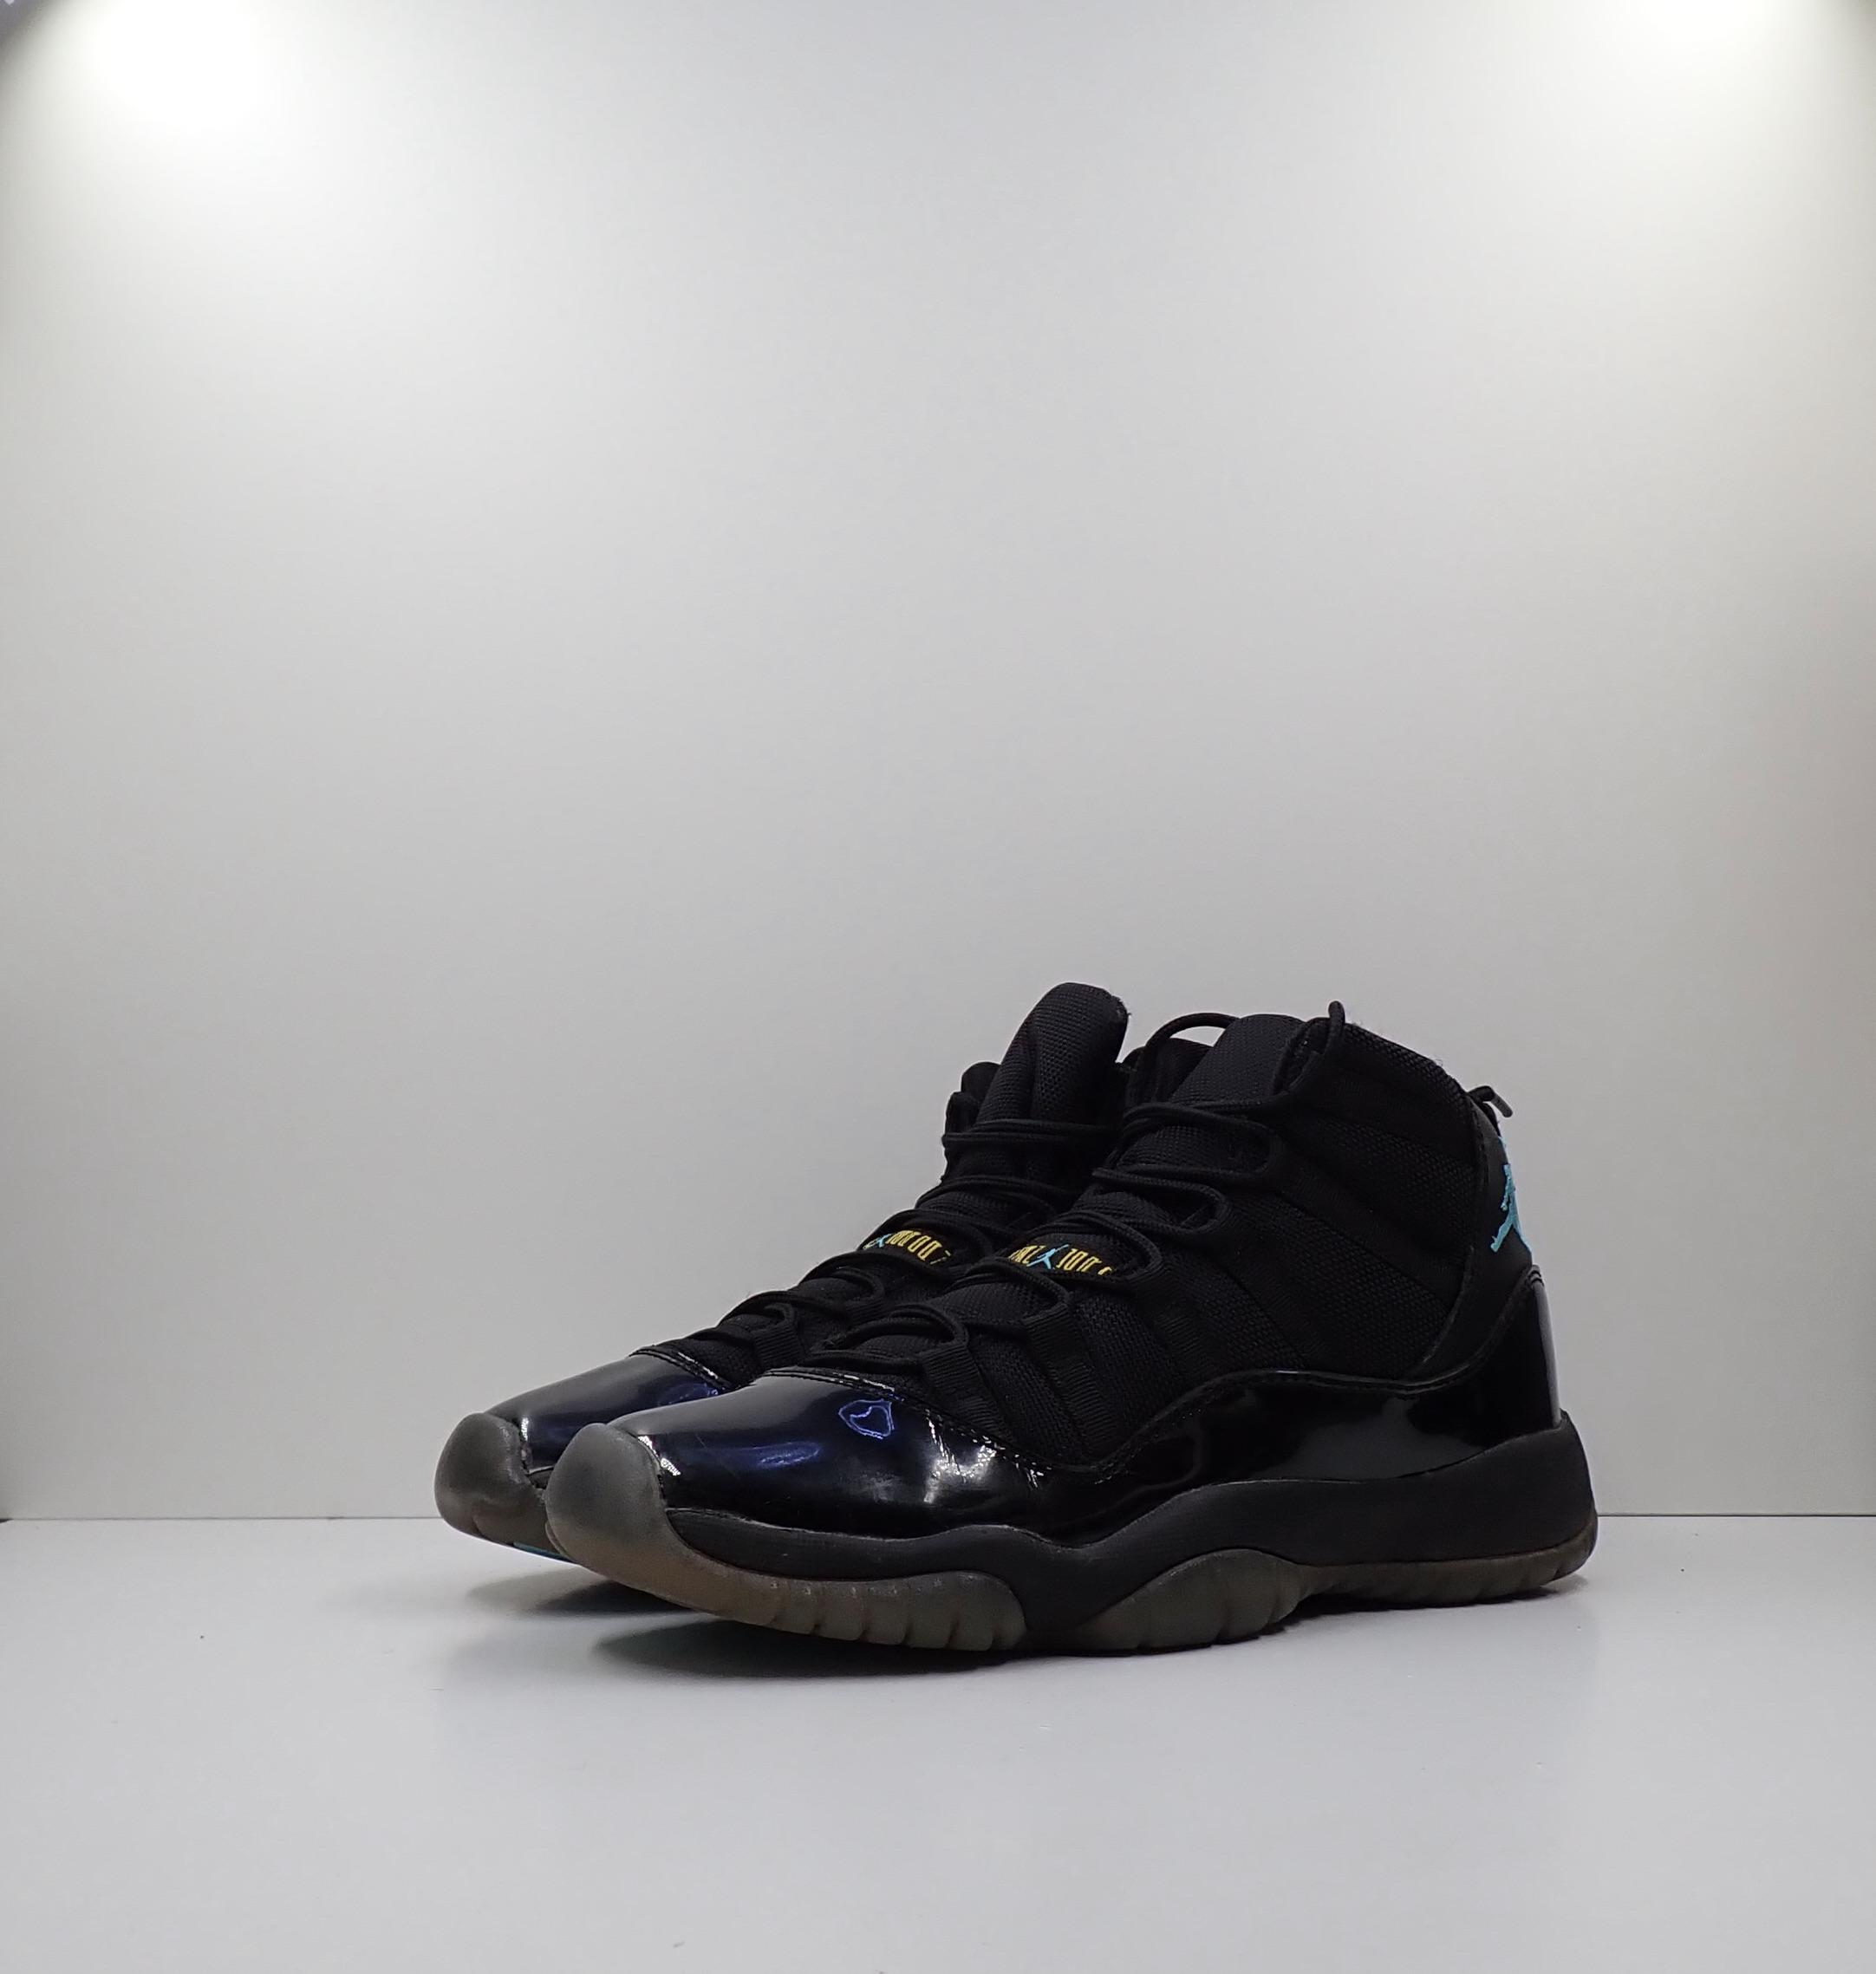 Jordan 11 Retro Gamma Blue (GS)